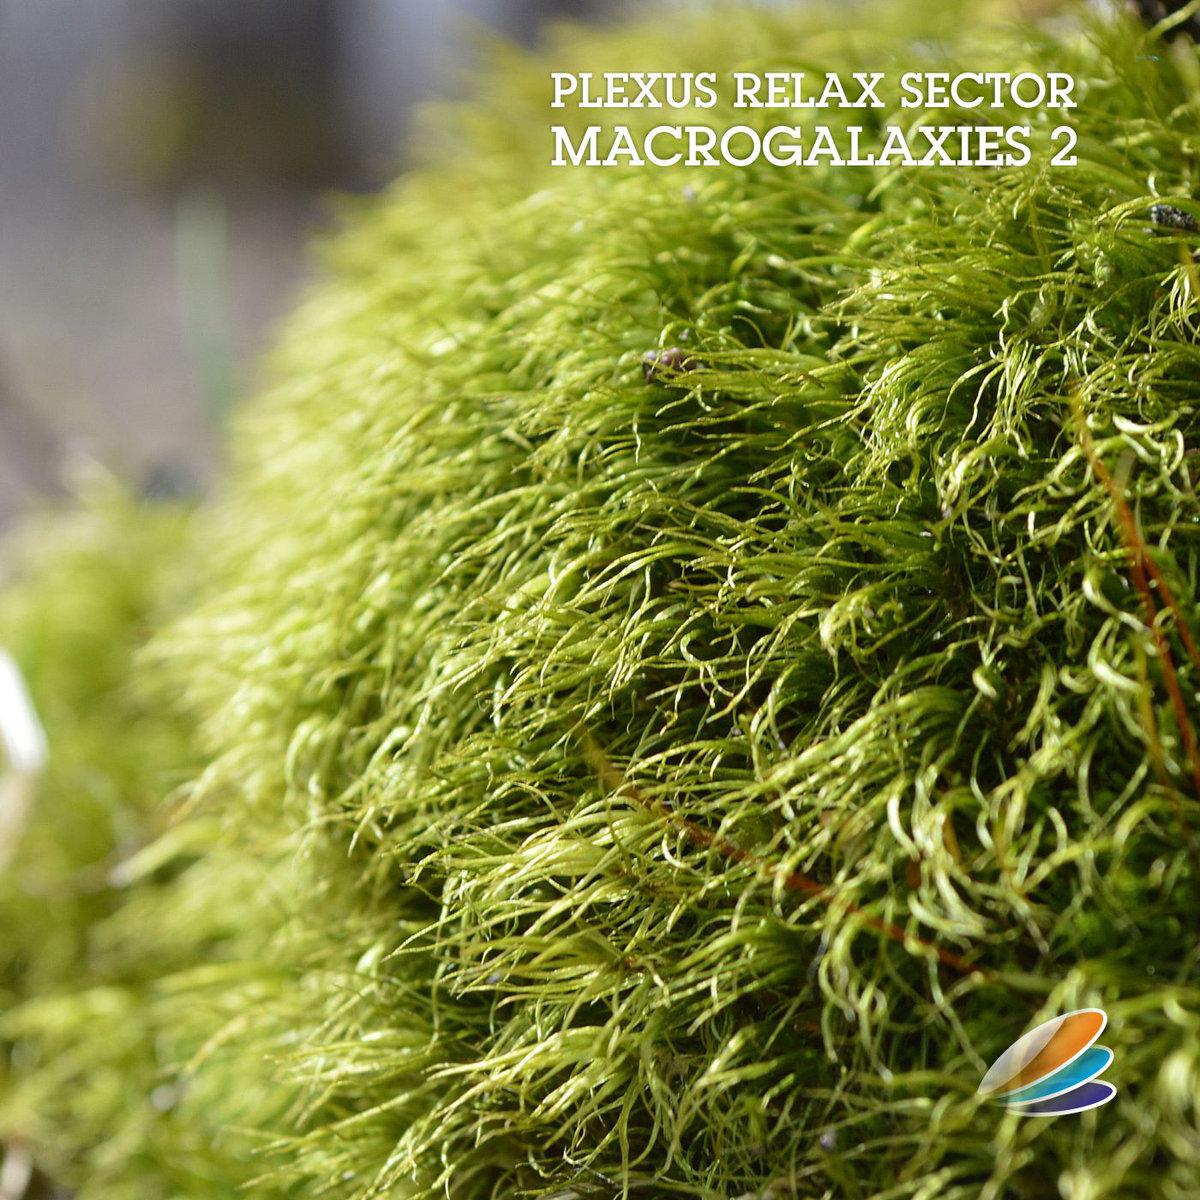 Plexus Relax Sector - Macrogalaxies 2